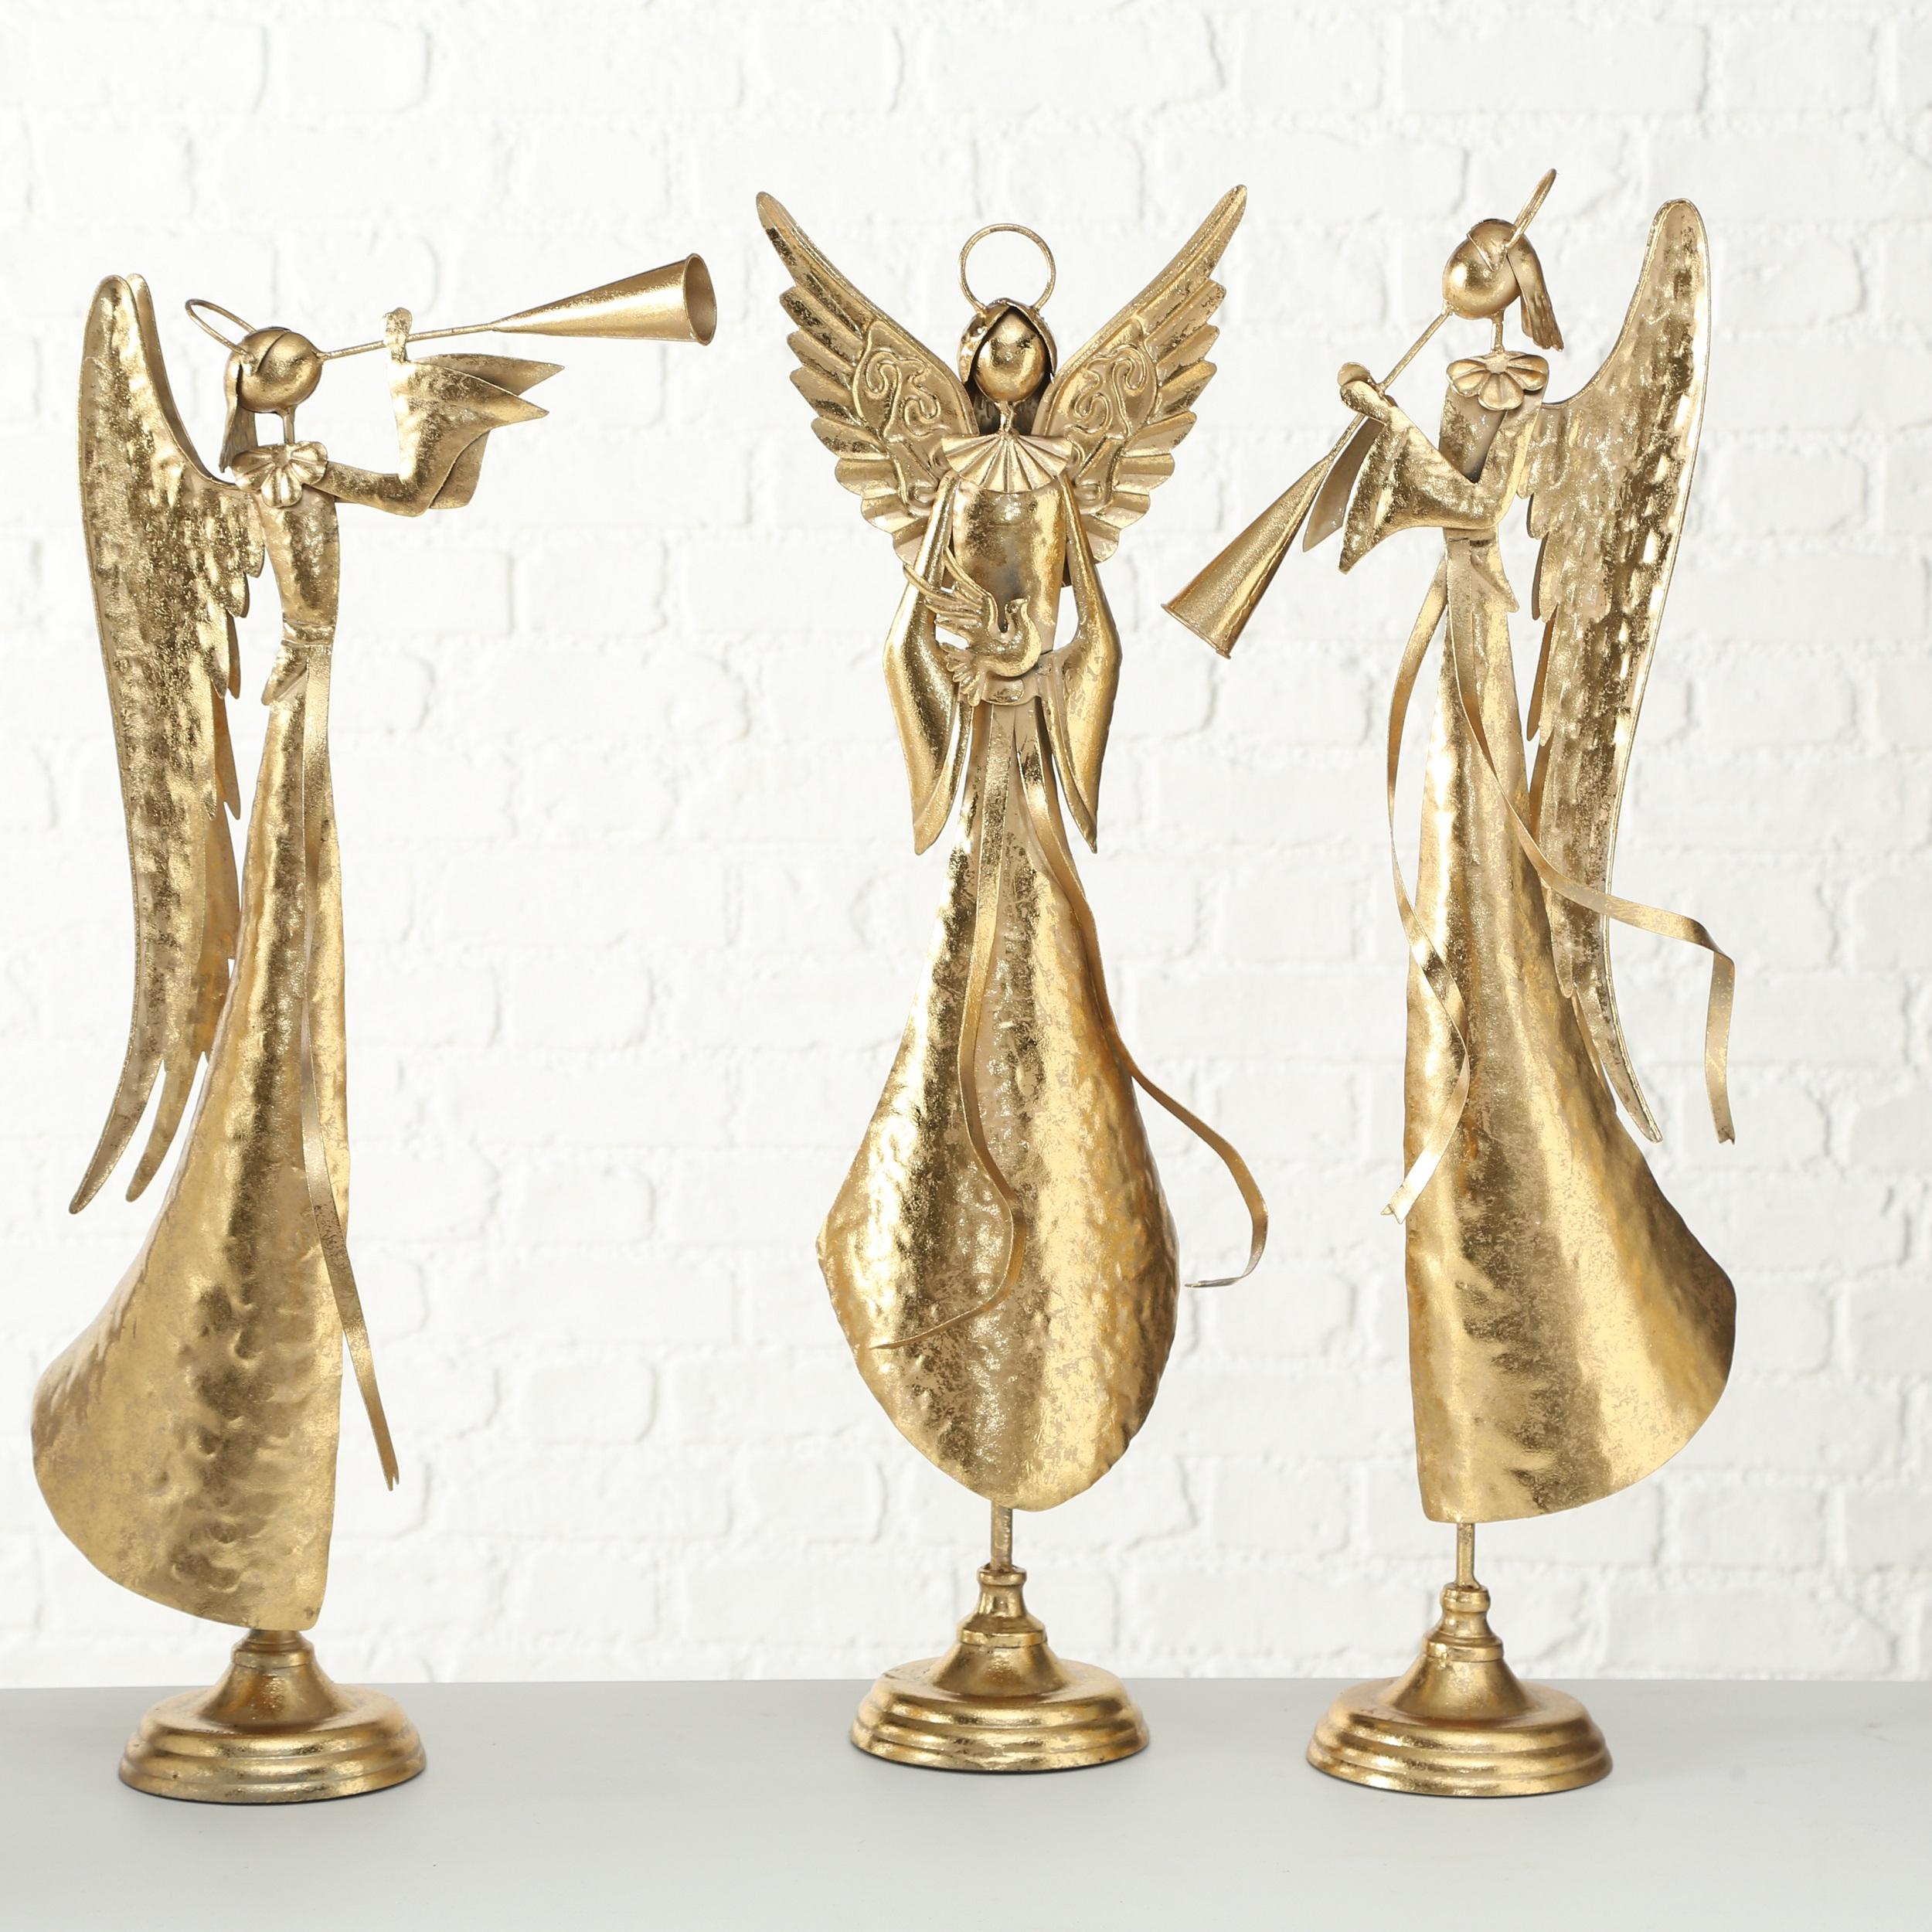 Decoratiune metalica Cory Angel Auriu, Modele Asortate, l29xA13xH72 cm imagine